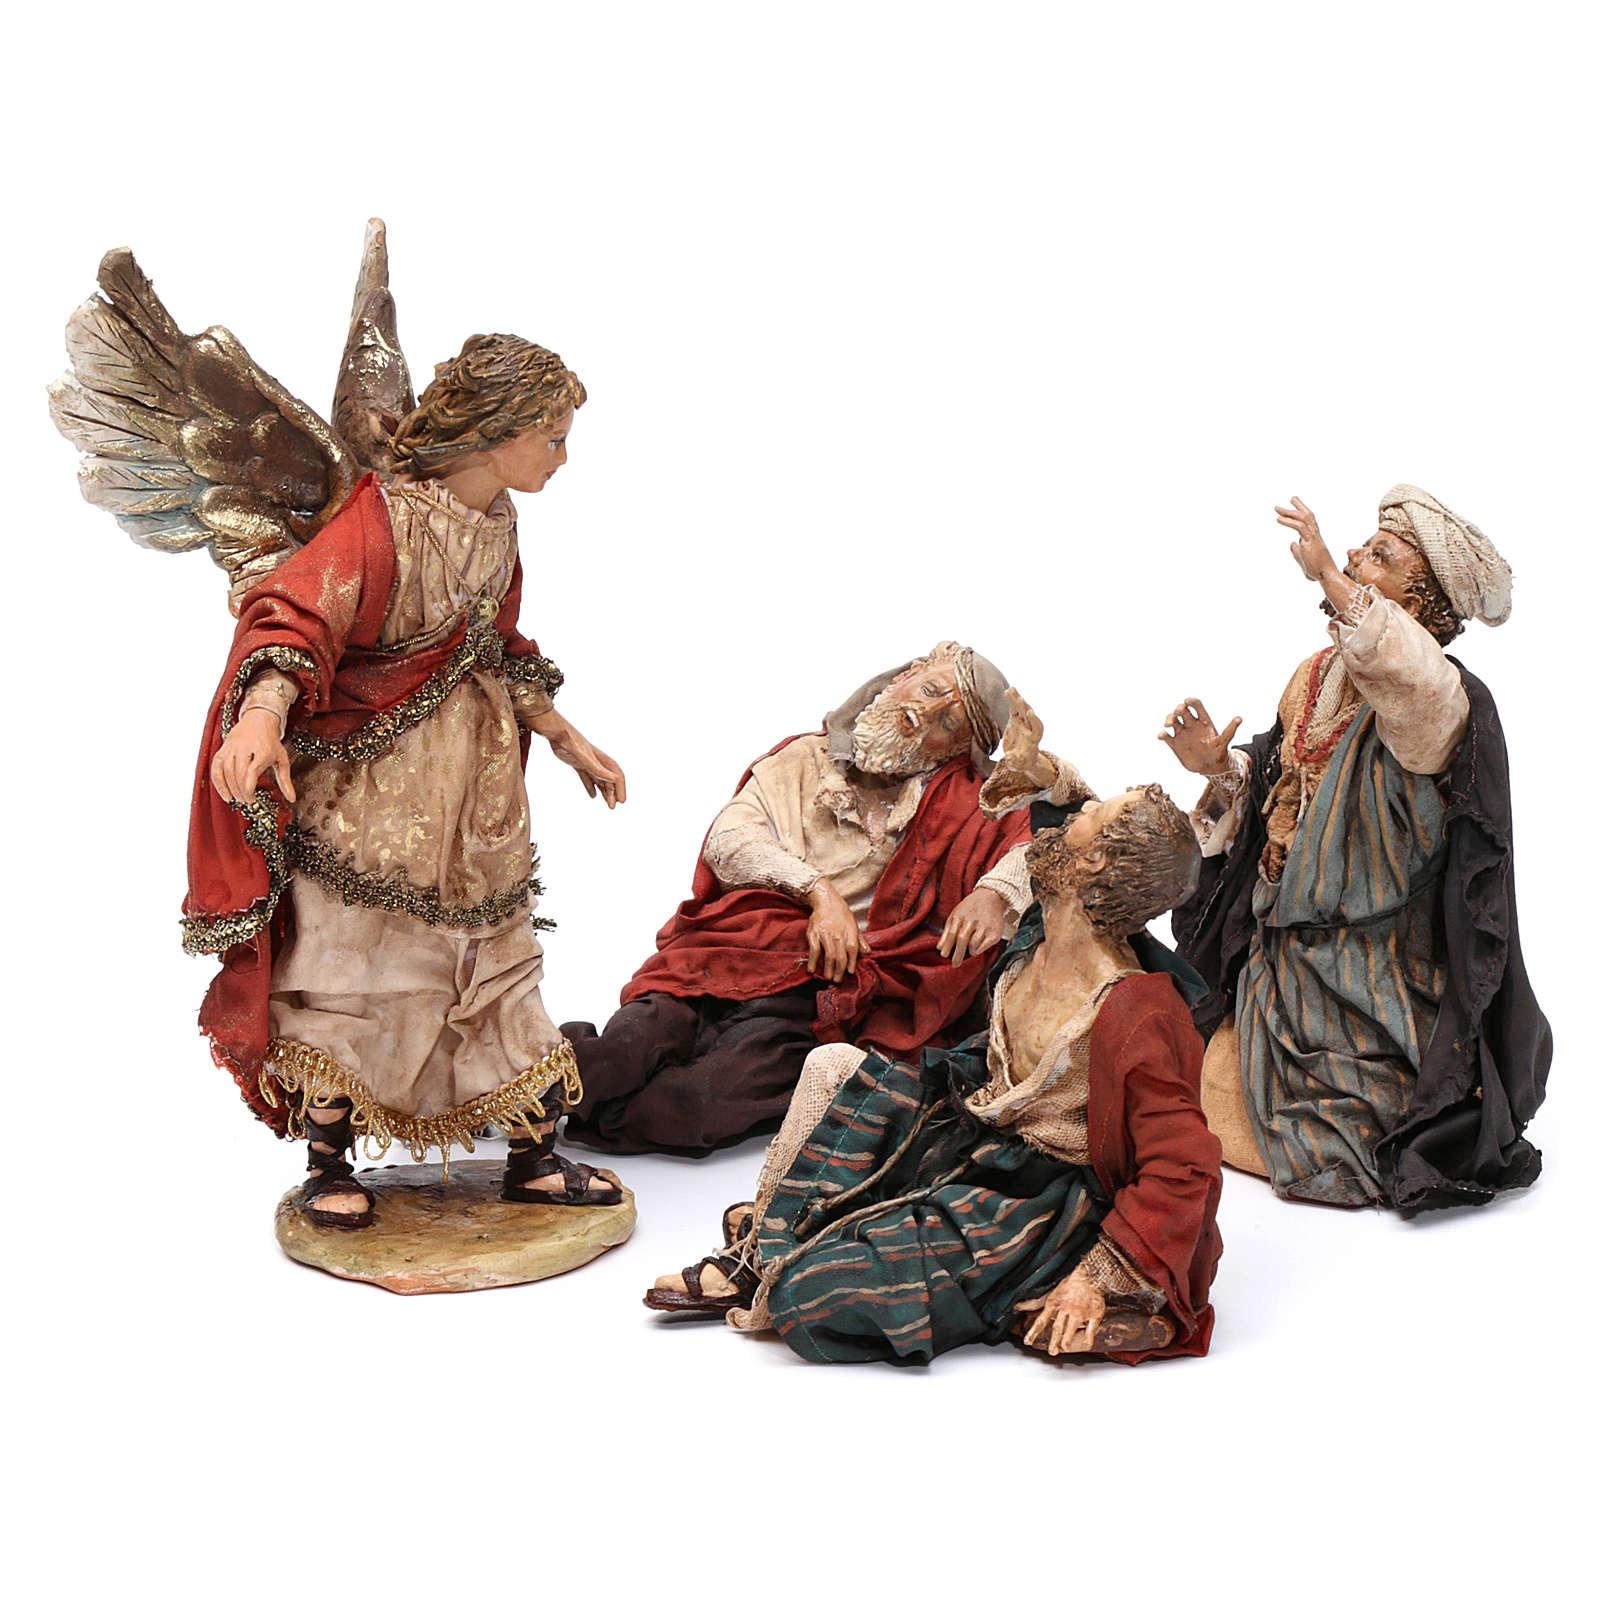 Annunciation to the Shepherds scene 13 cm Angela Tripi 4